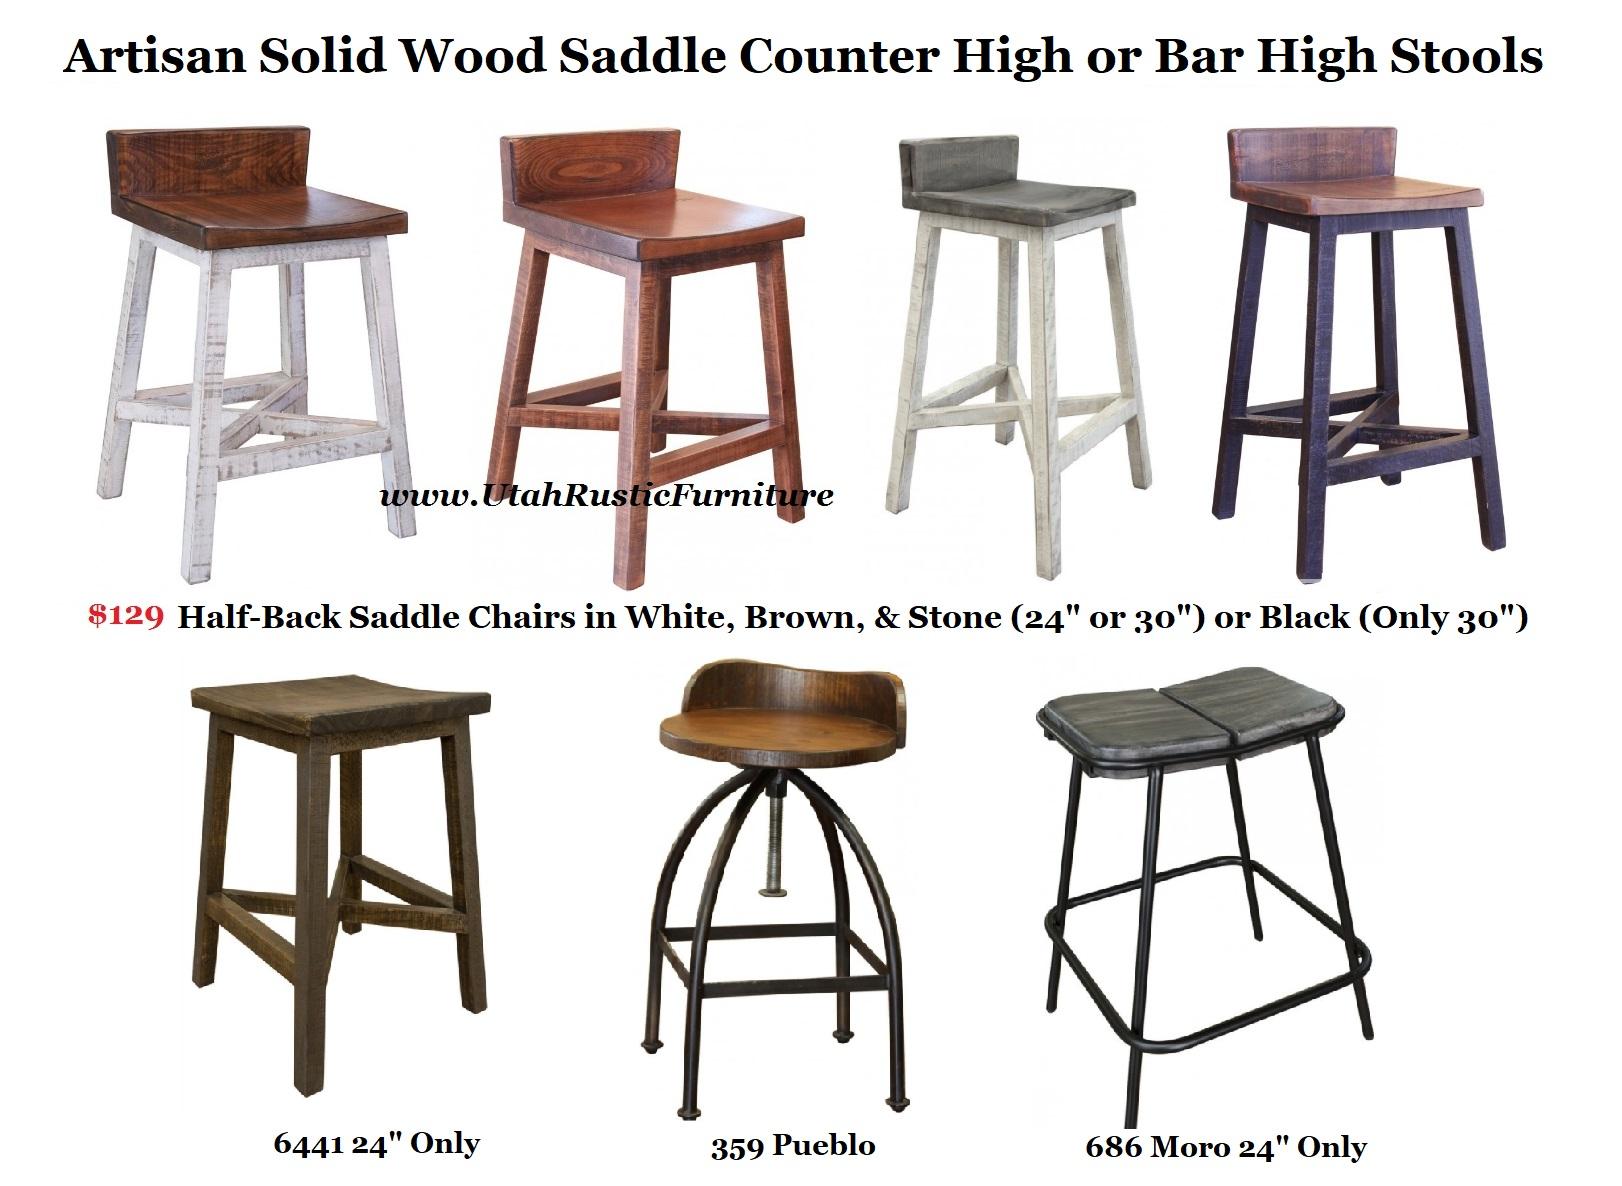 Superb Bradleys Furniture Etc Utah Rustic Dining Room Furniture Theyellowbook Wood Chair Design Ideas Theyellowbookinfo